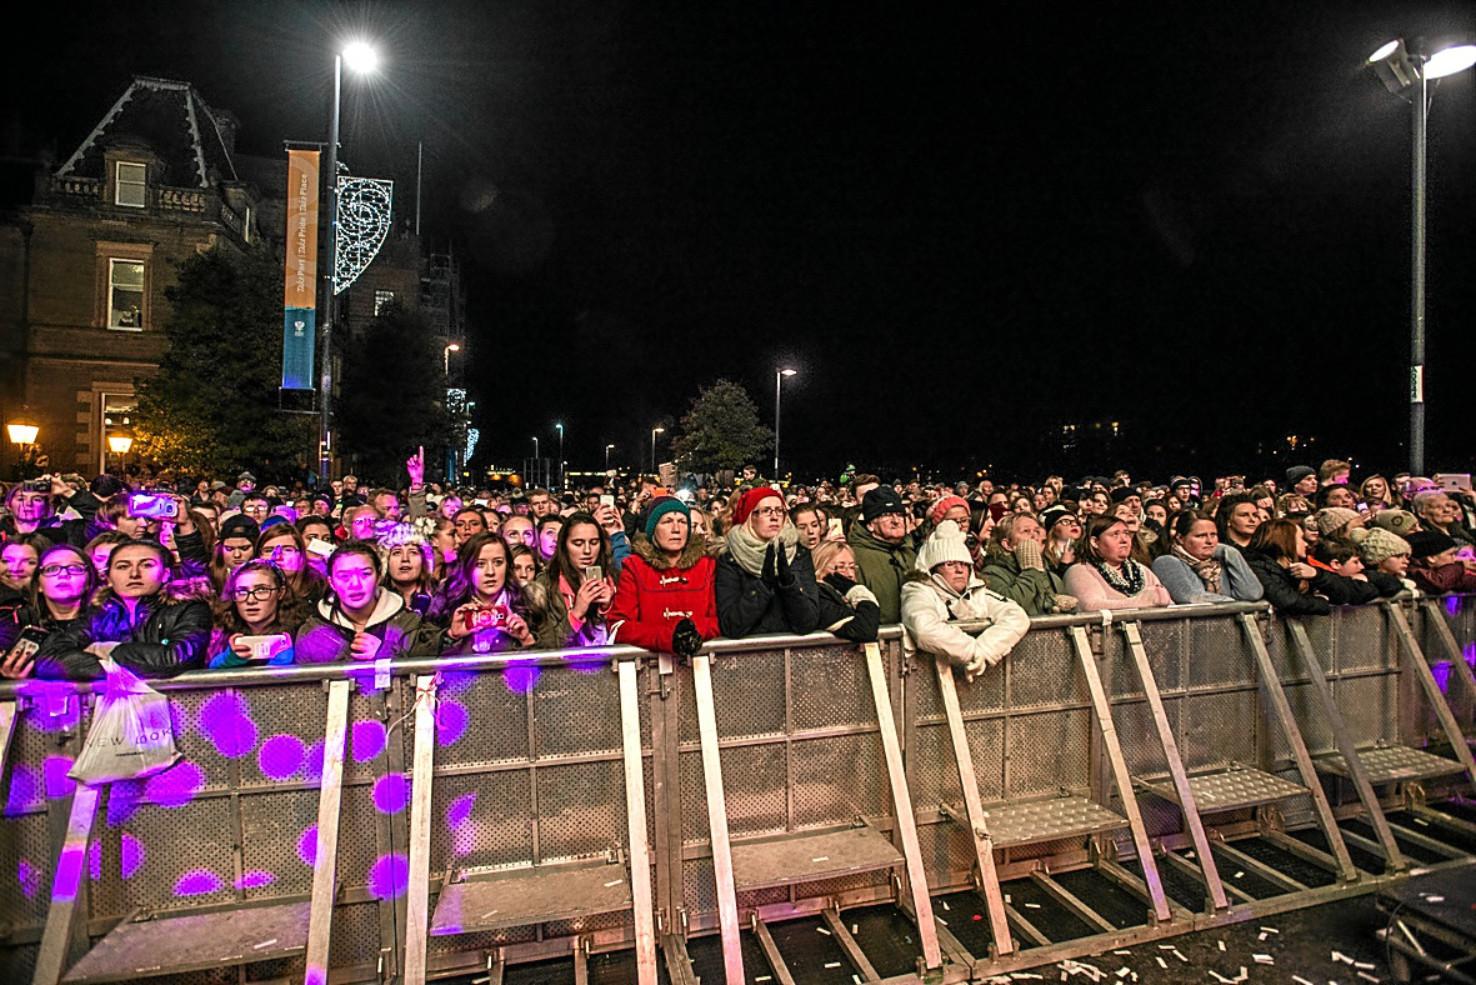 Crowds at Perth Winter Festival.